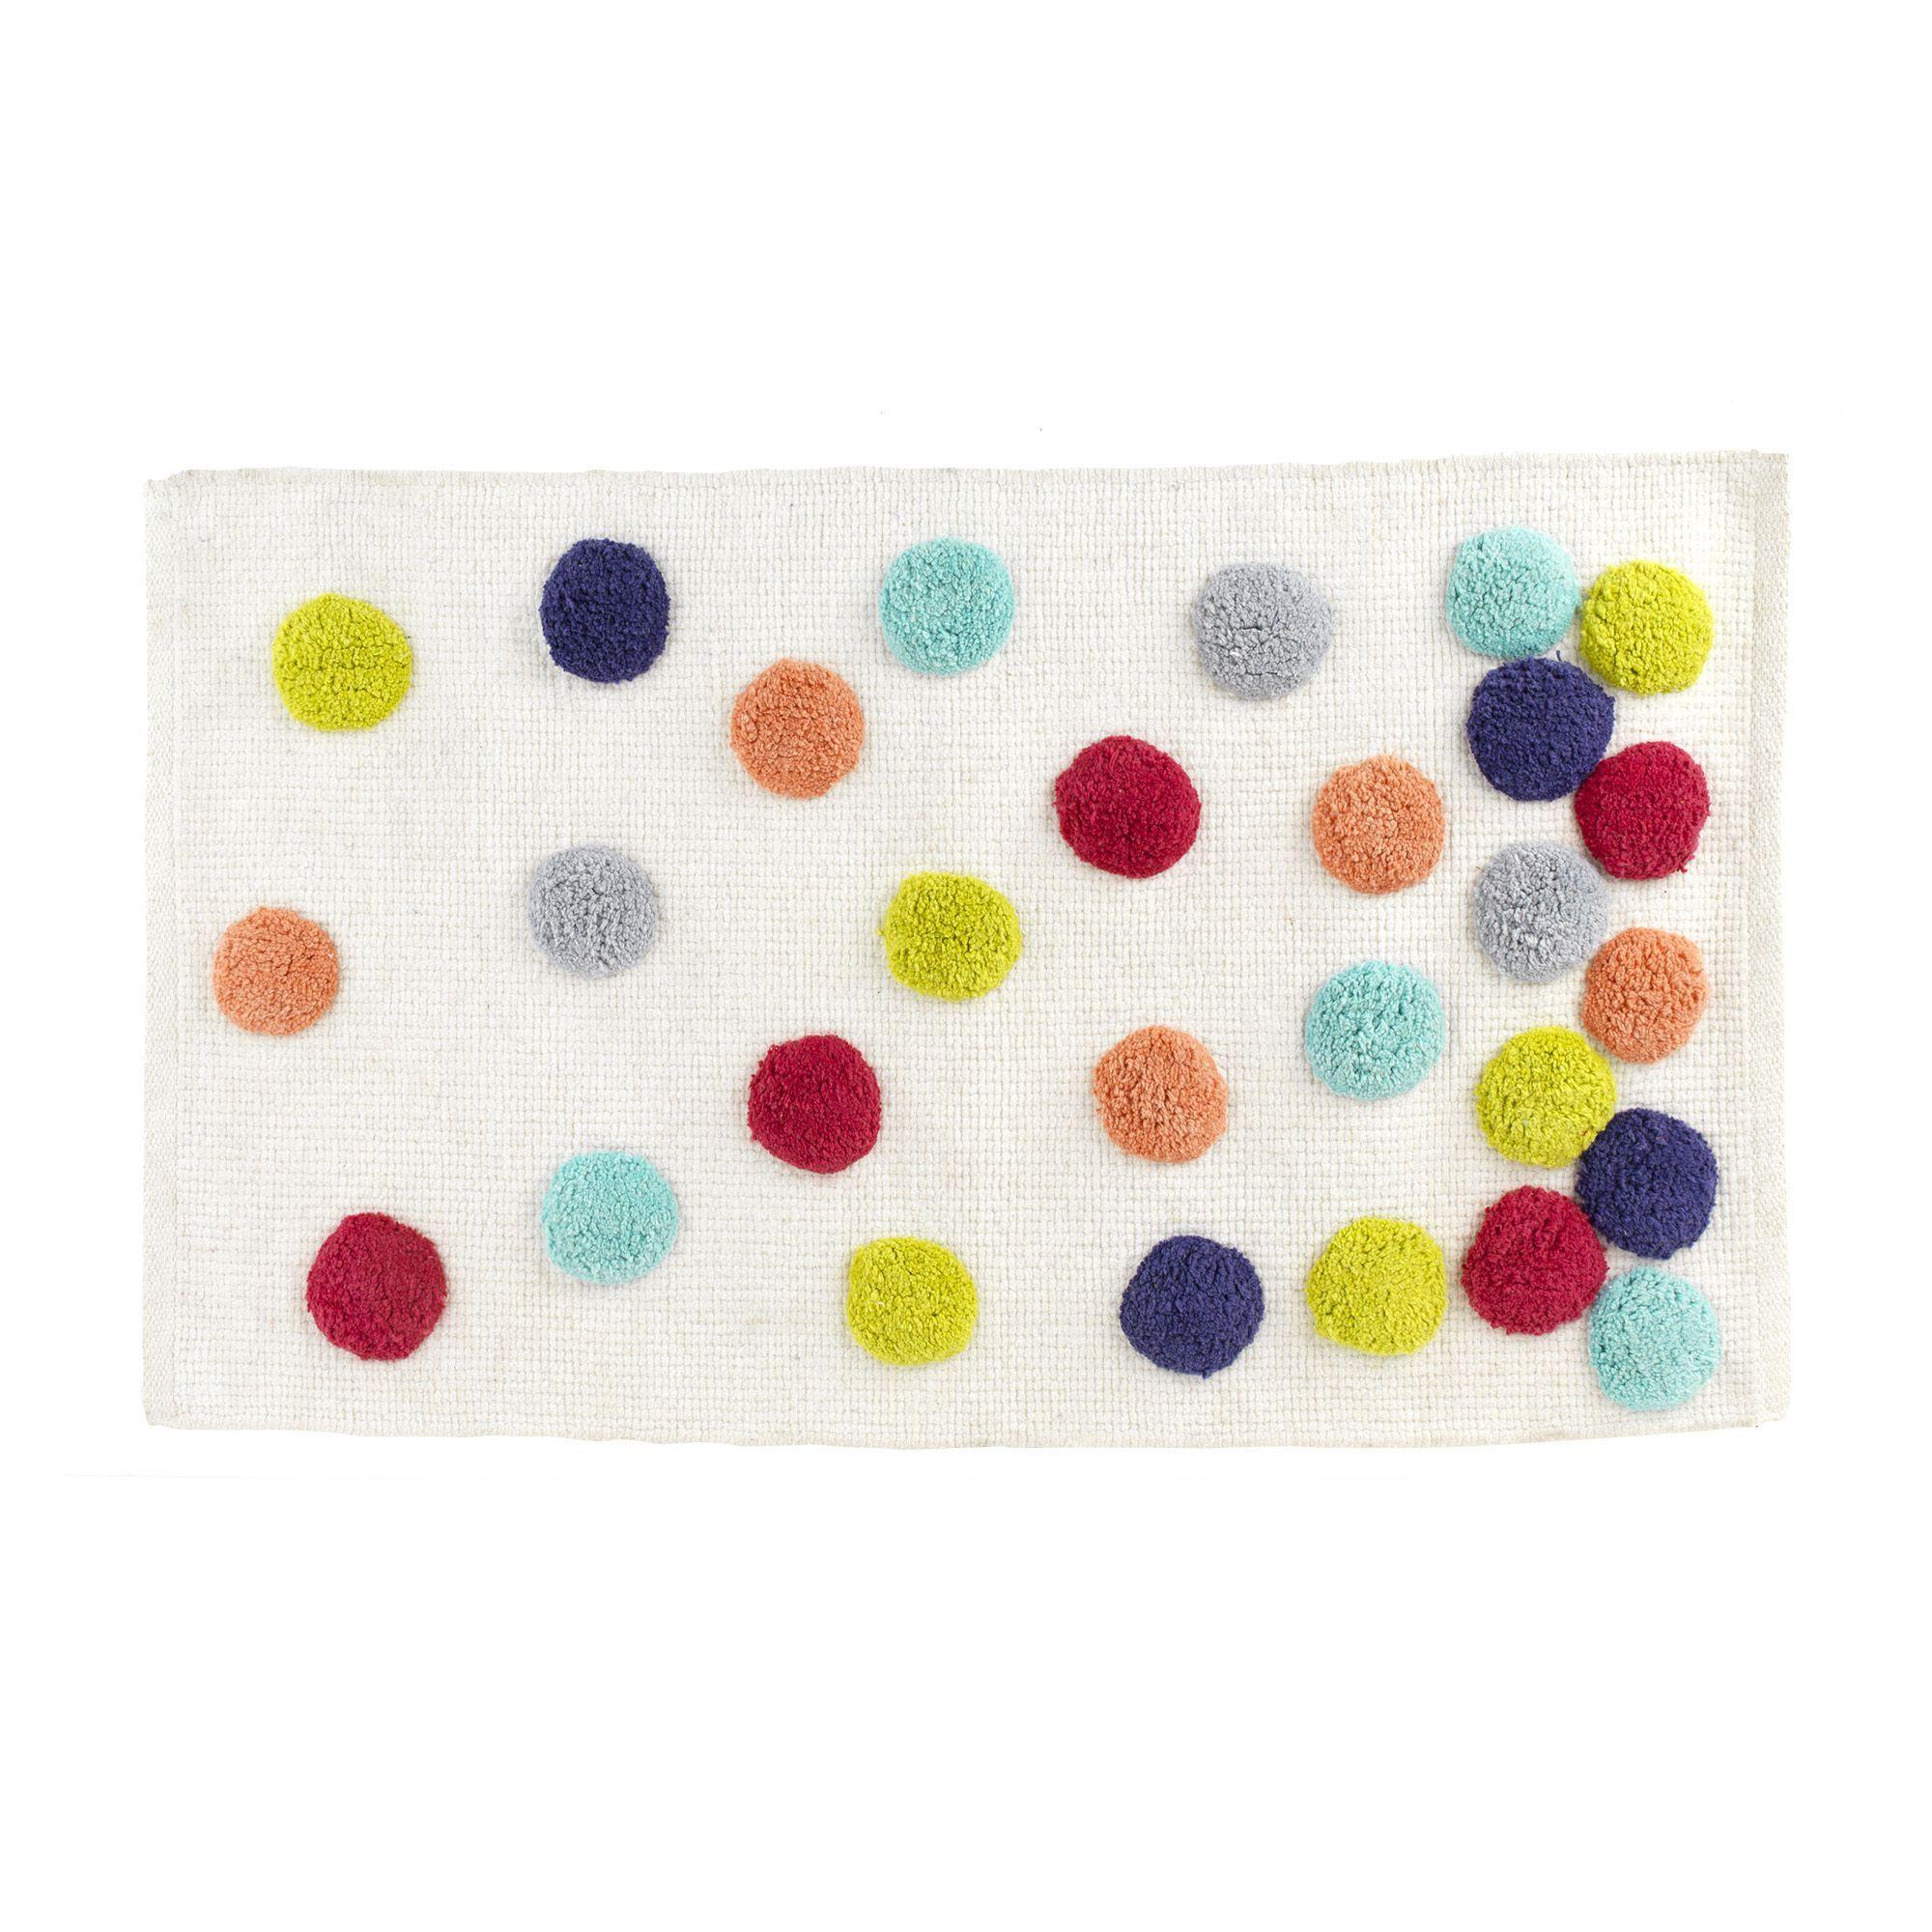 Oakland Salle De Bain ~ tapis de bain multicolore confetti les tapis de bain et